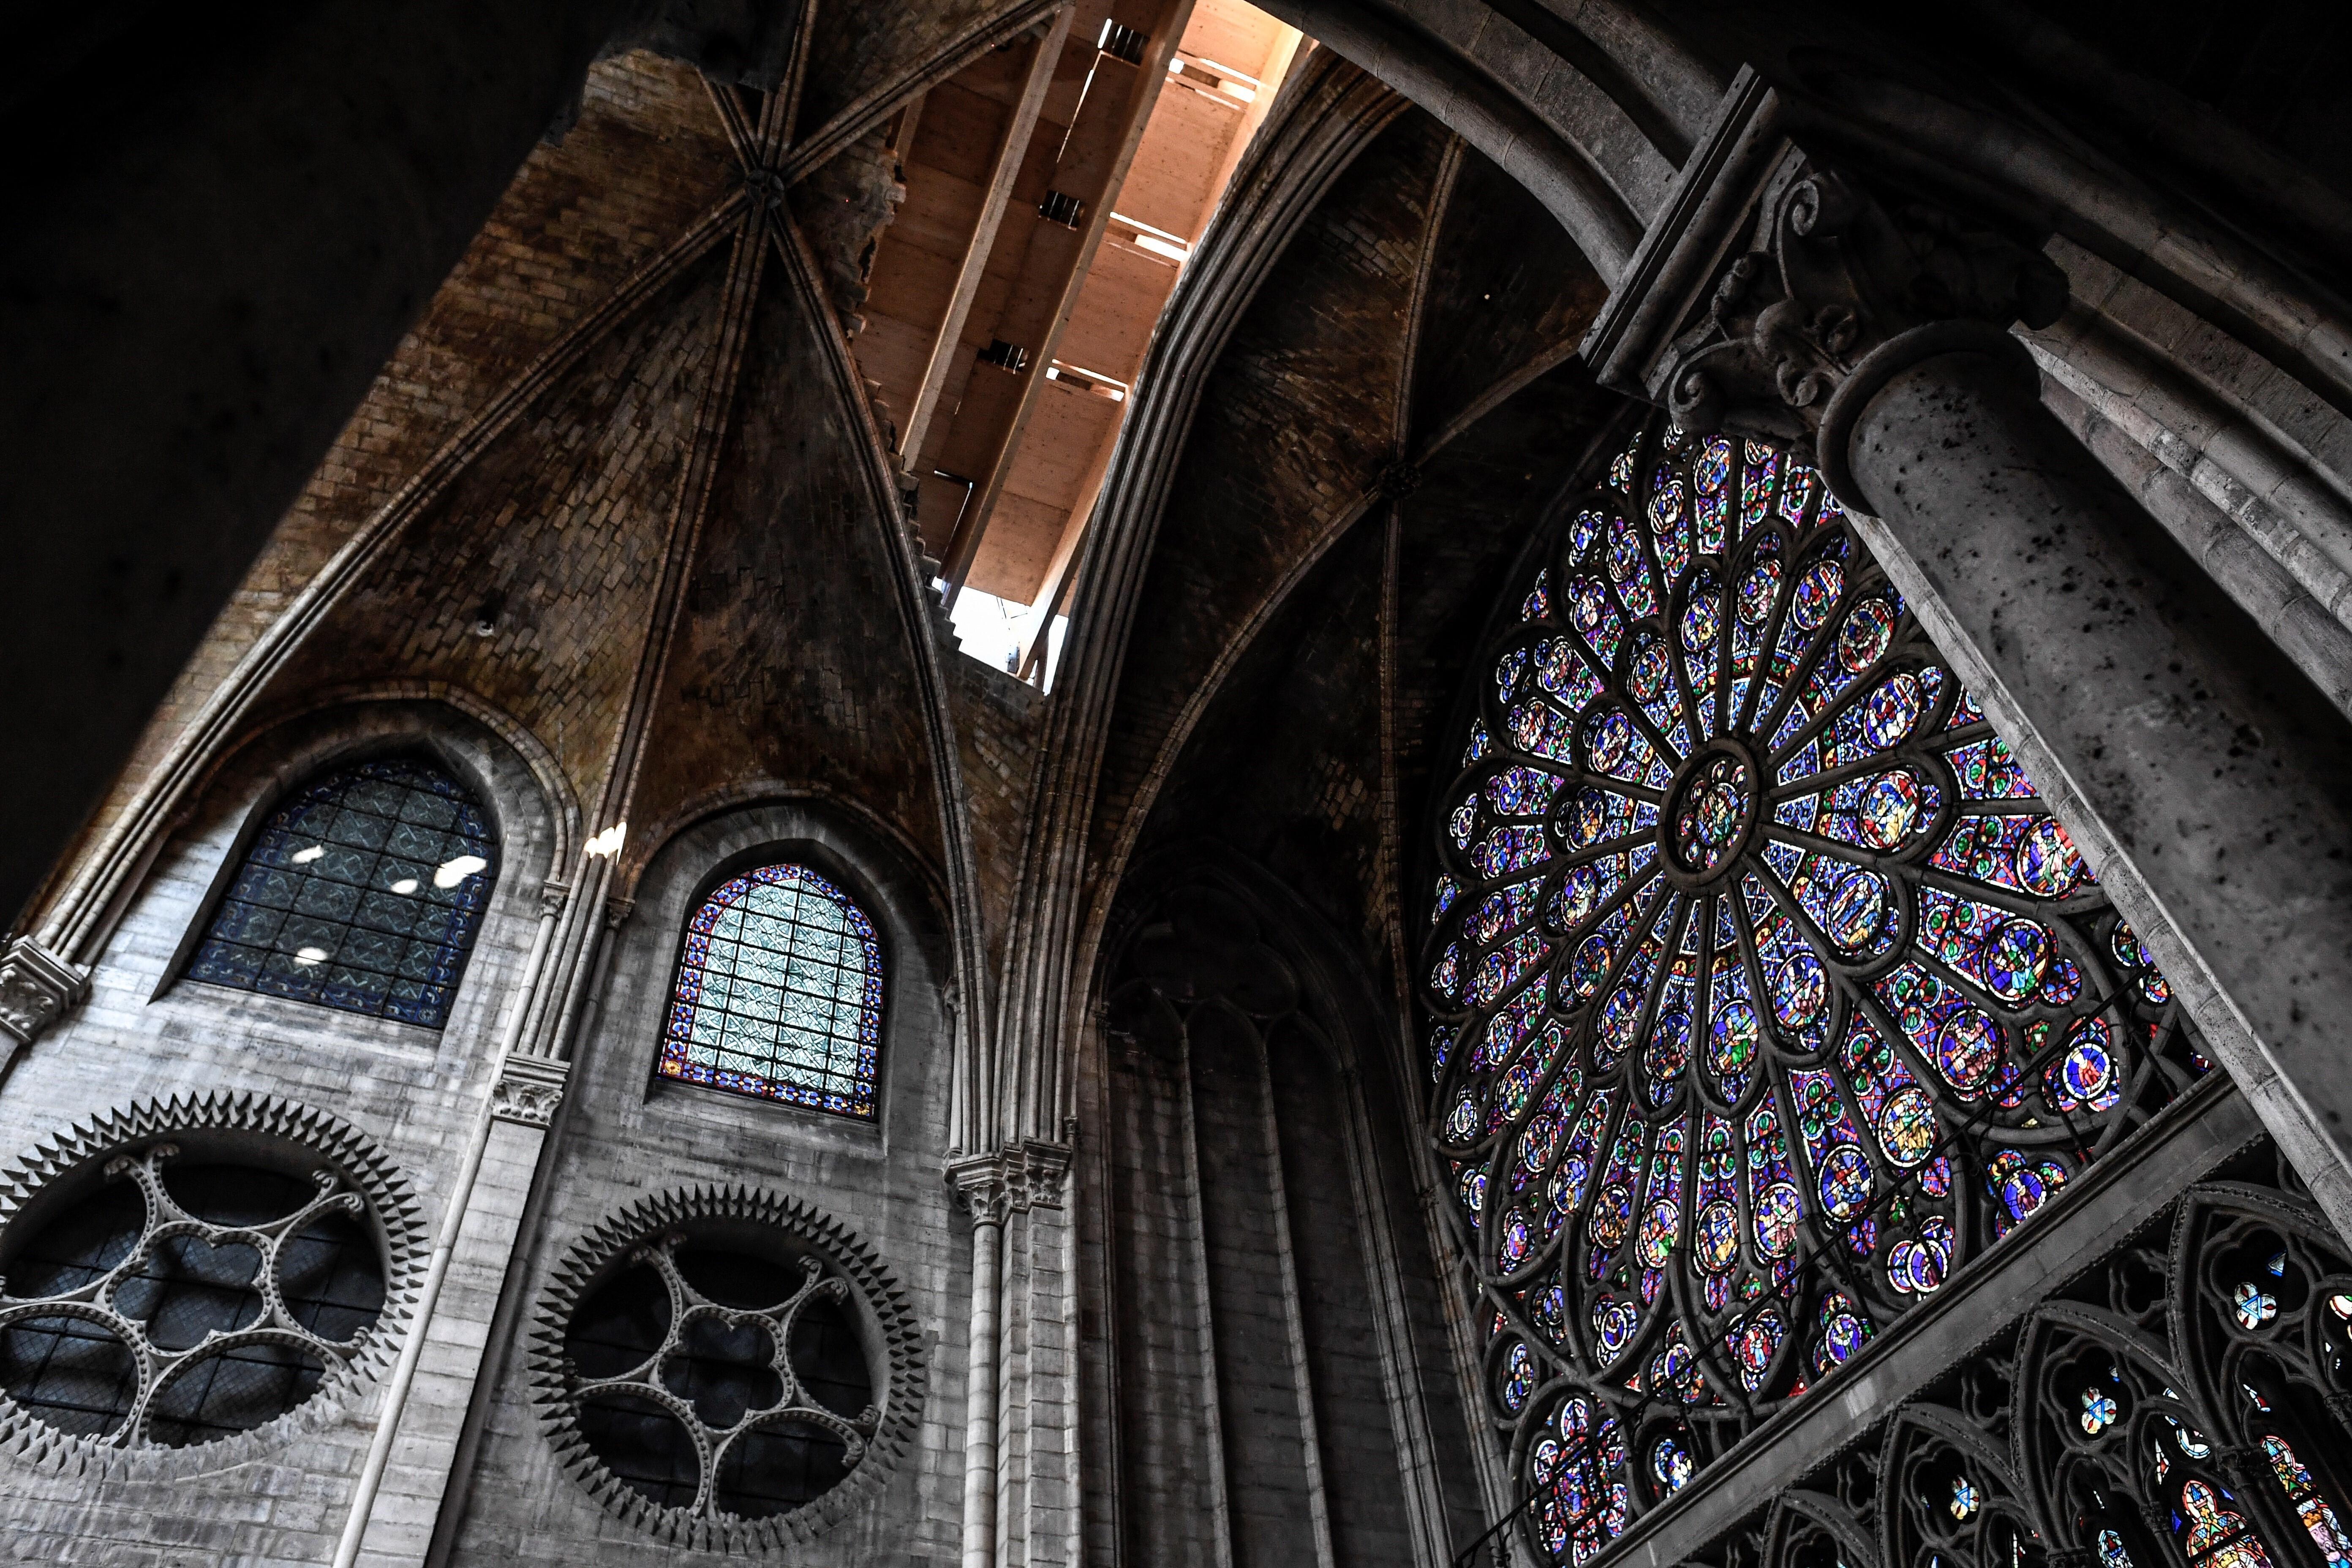 PHOTOS: Rebuilding Notre Dame